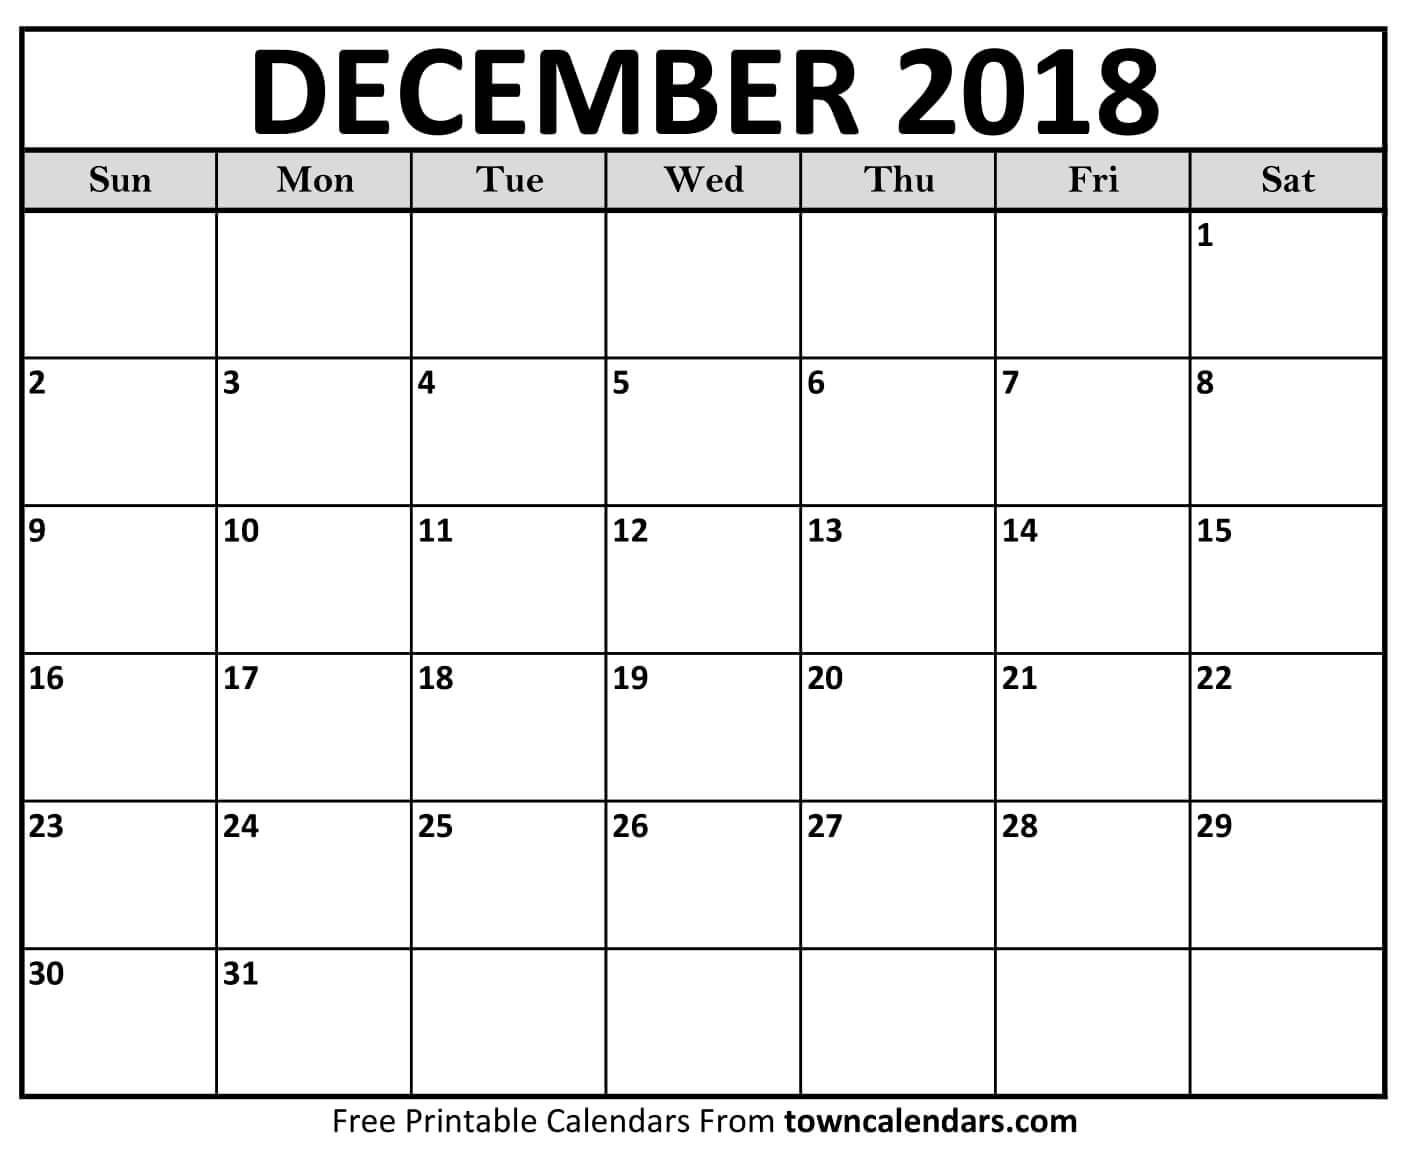 Printable 2018 December Calendar Template - Printable Calendar 2019 inside December Calendar Printable Template